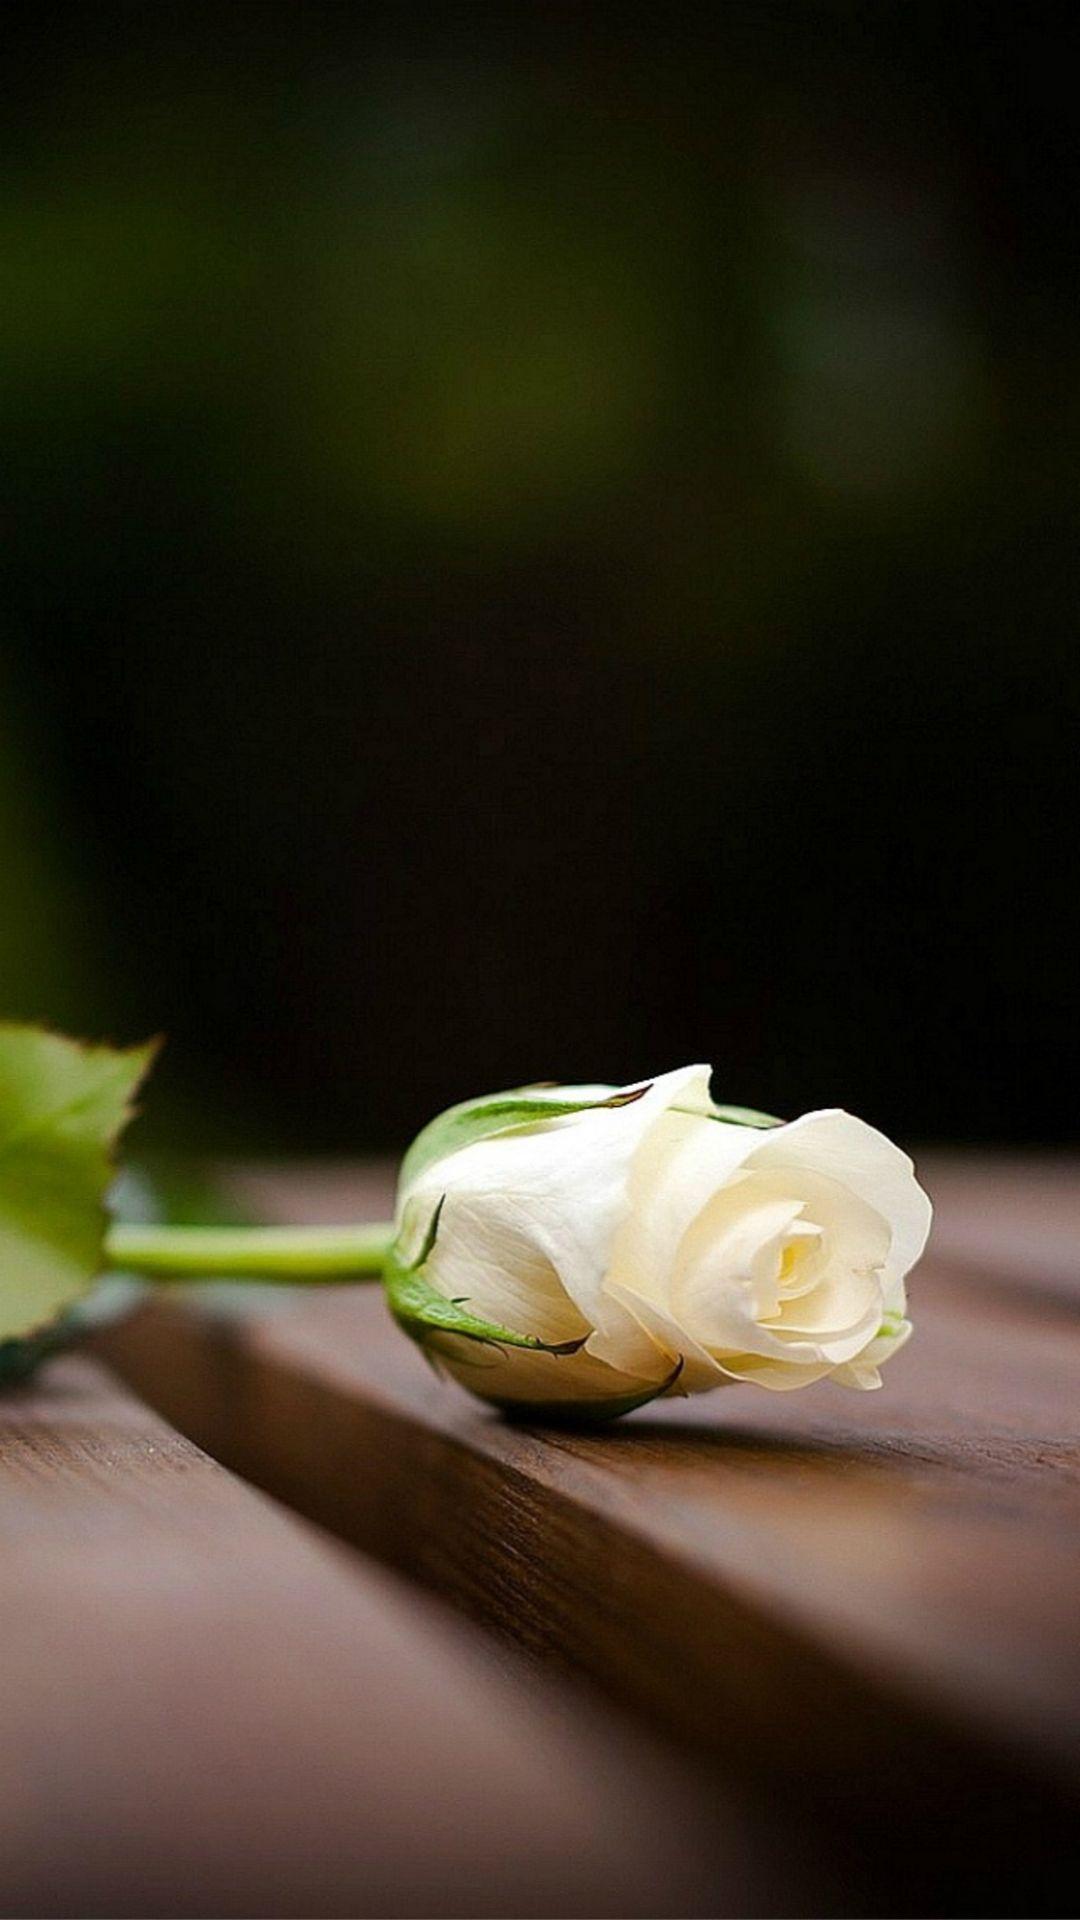 Elegant White Rose On Wood Blur IPhone 6 Wallpaper